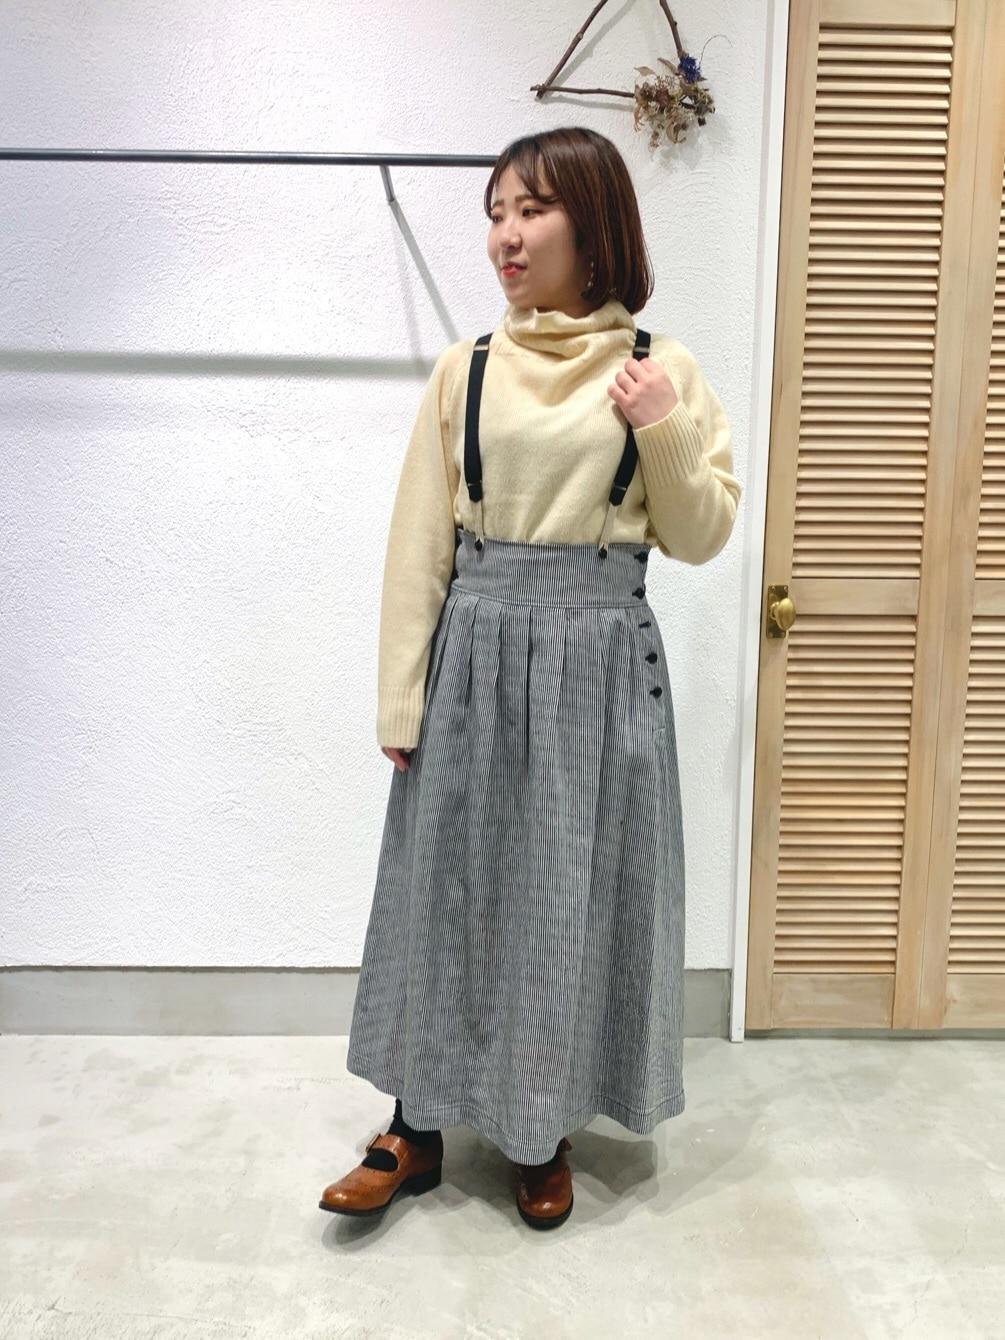 chambre de charme 横浜ジョイナス 身長:155cm 2020.12.15